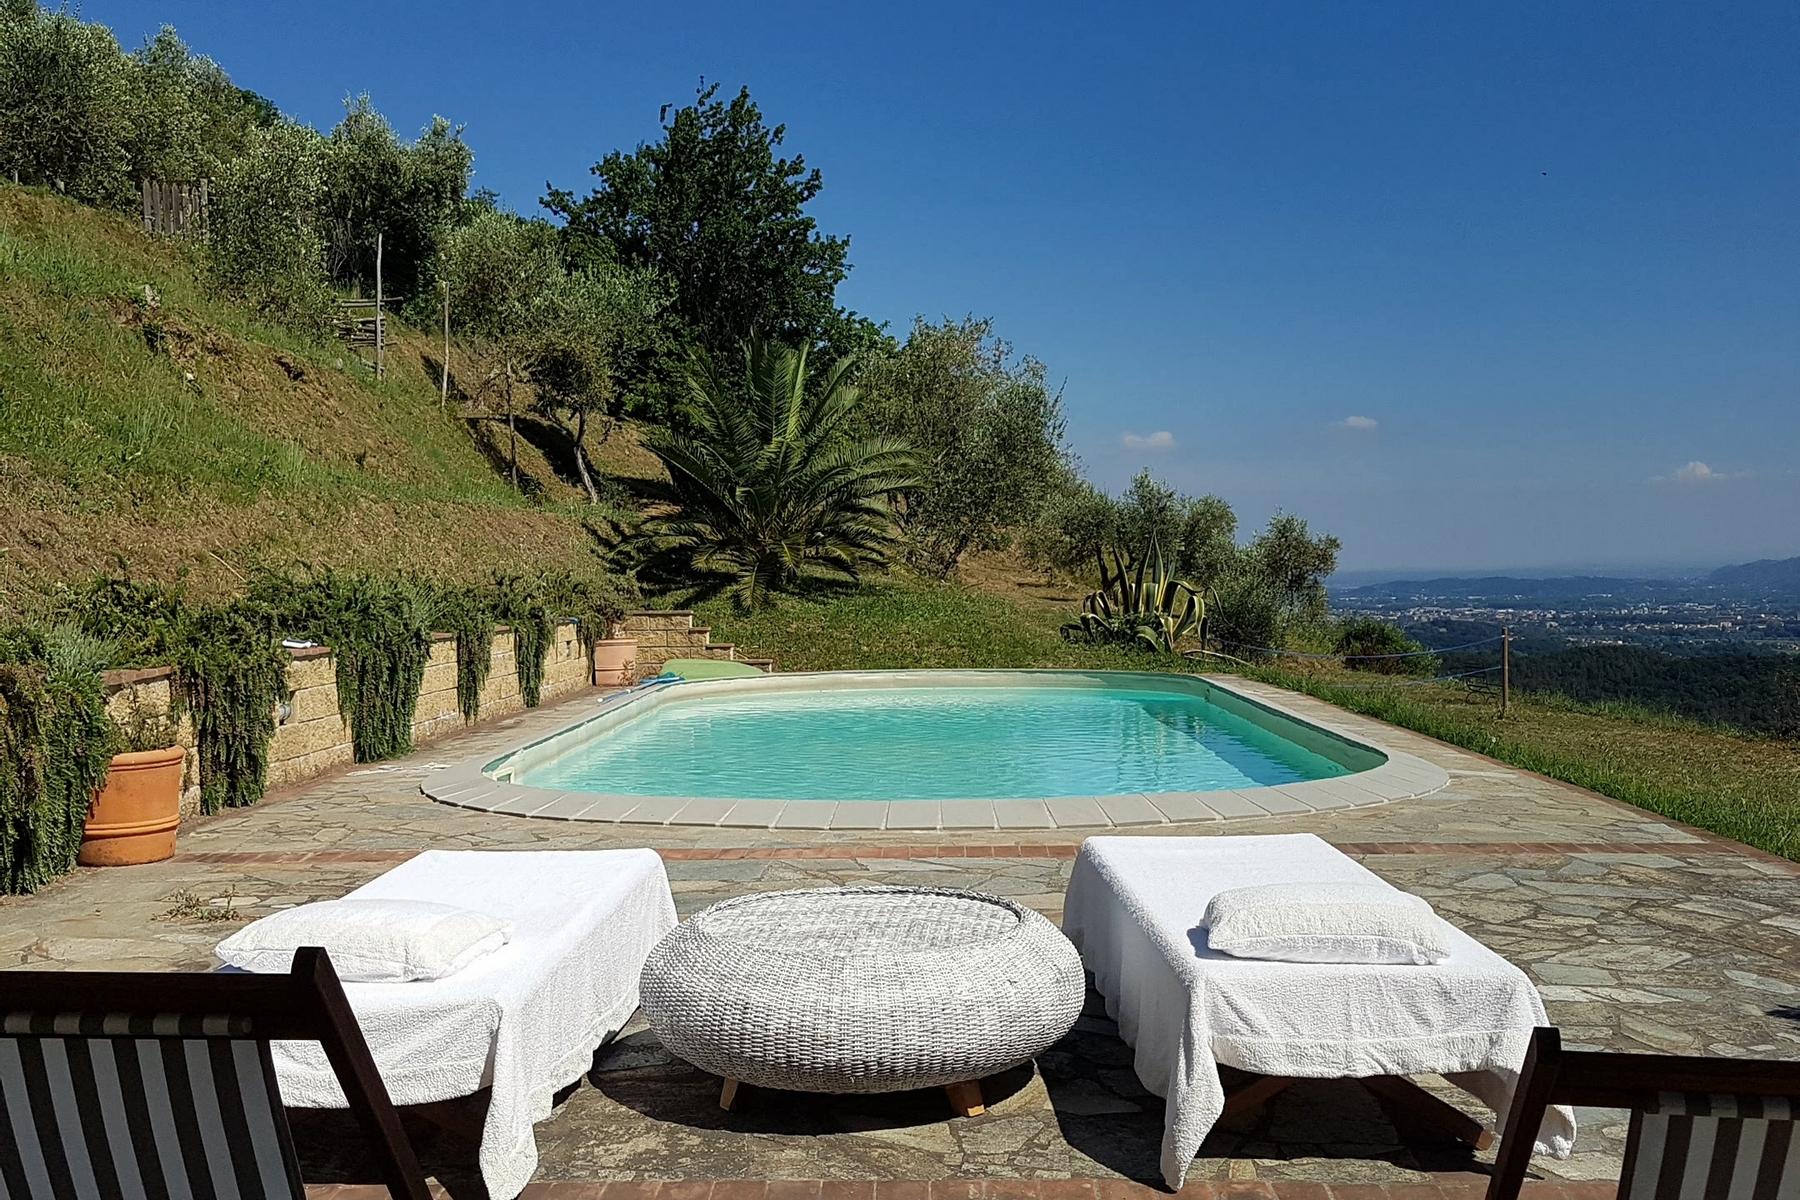 Villa in Vendita a Lucca: 5 locali, 550 mq - Foto 7